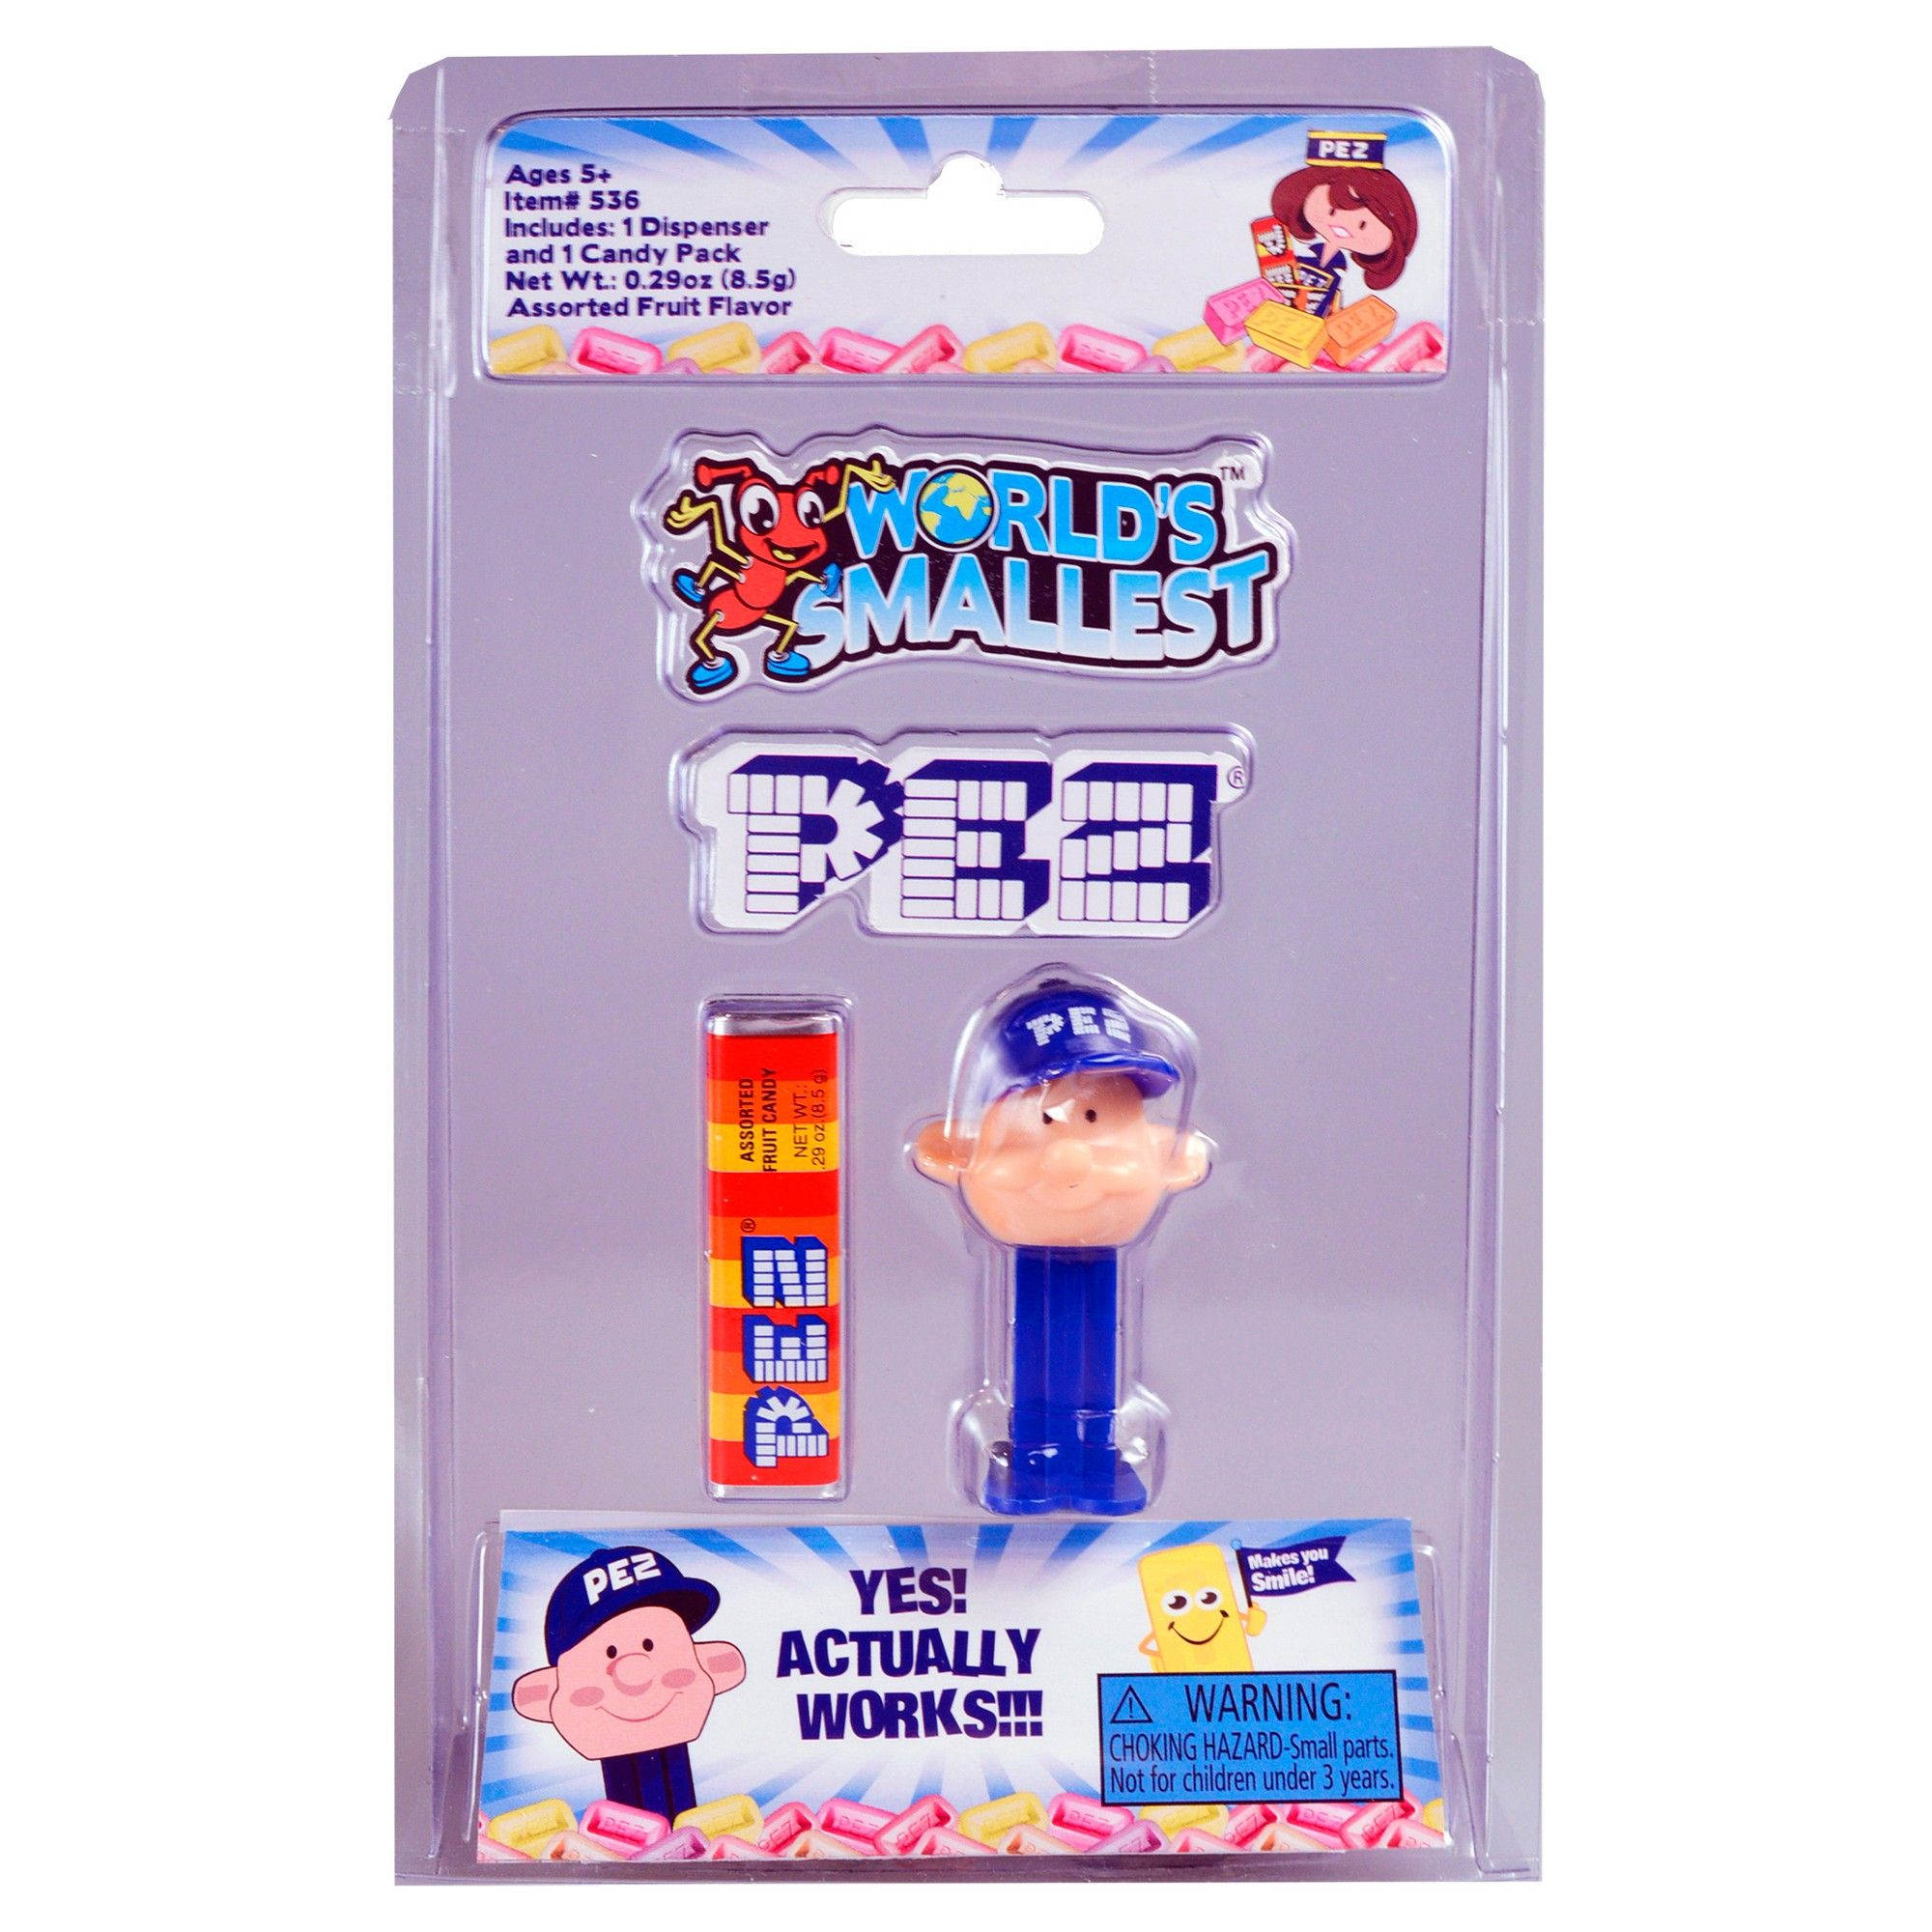 world/'s smallest toys World's Smallest Pez Dispensers PEZ BOY